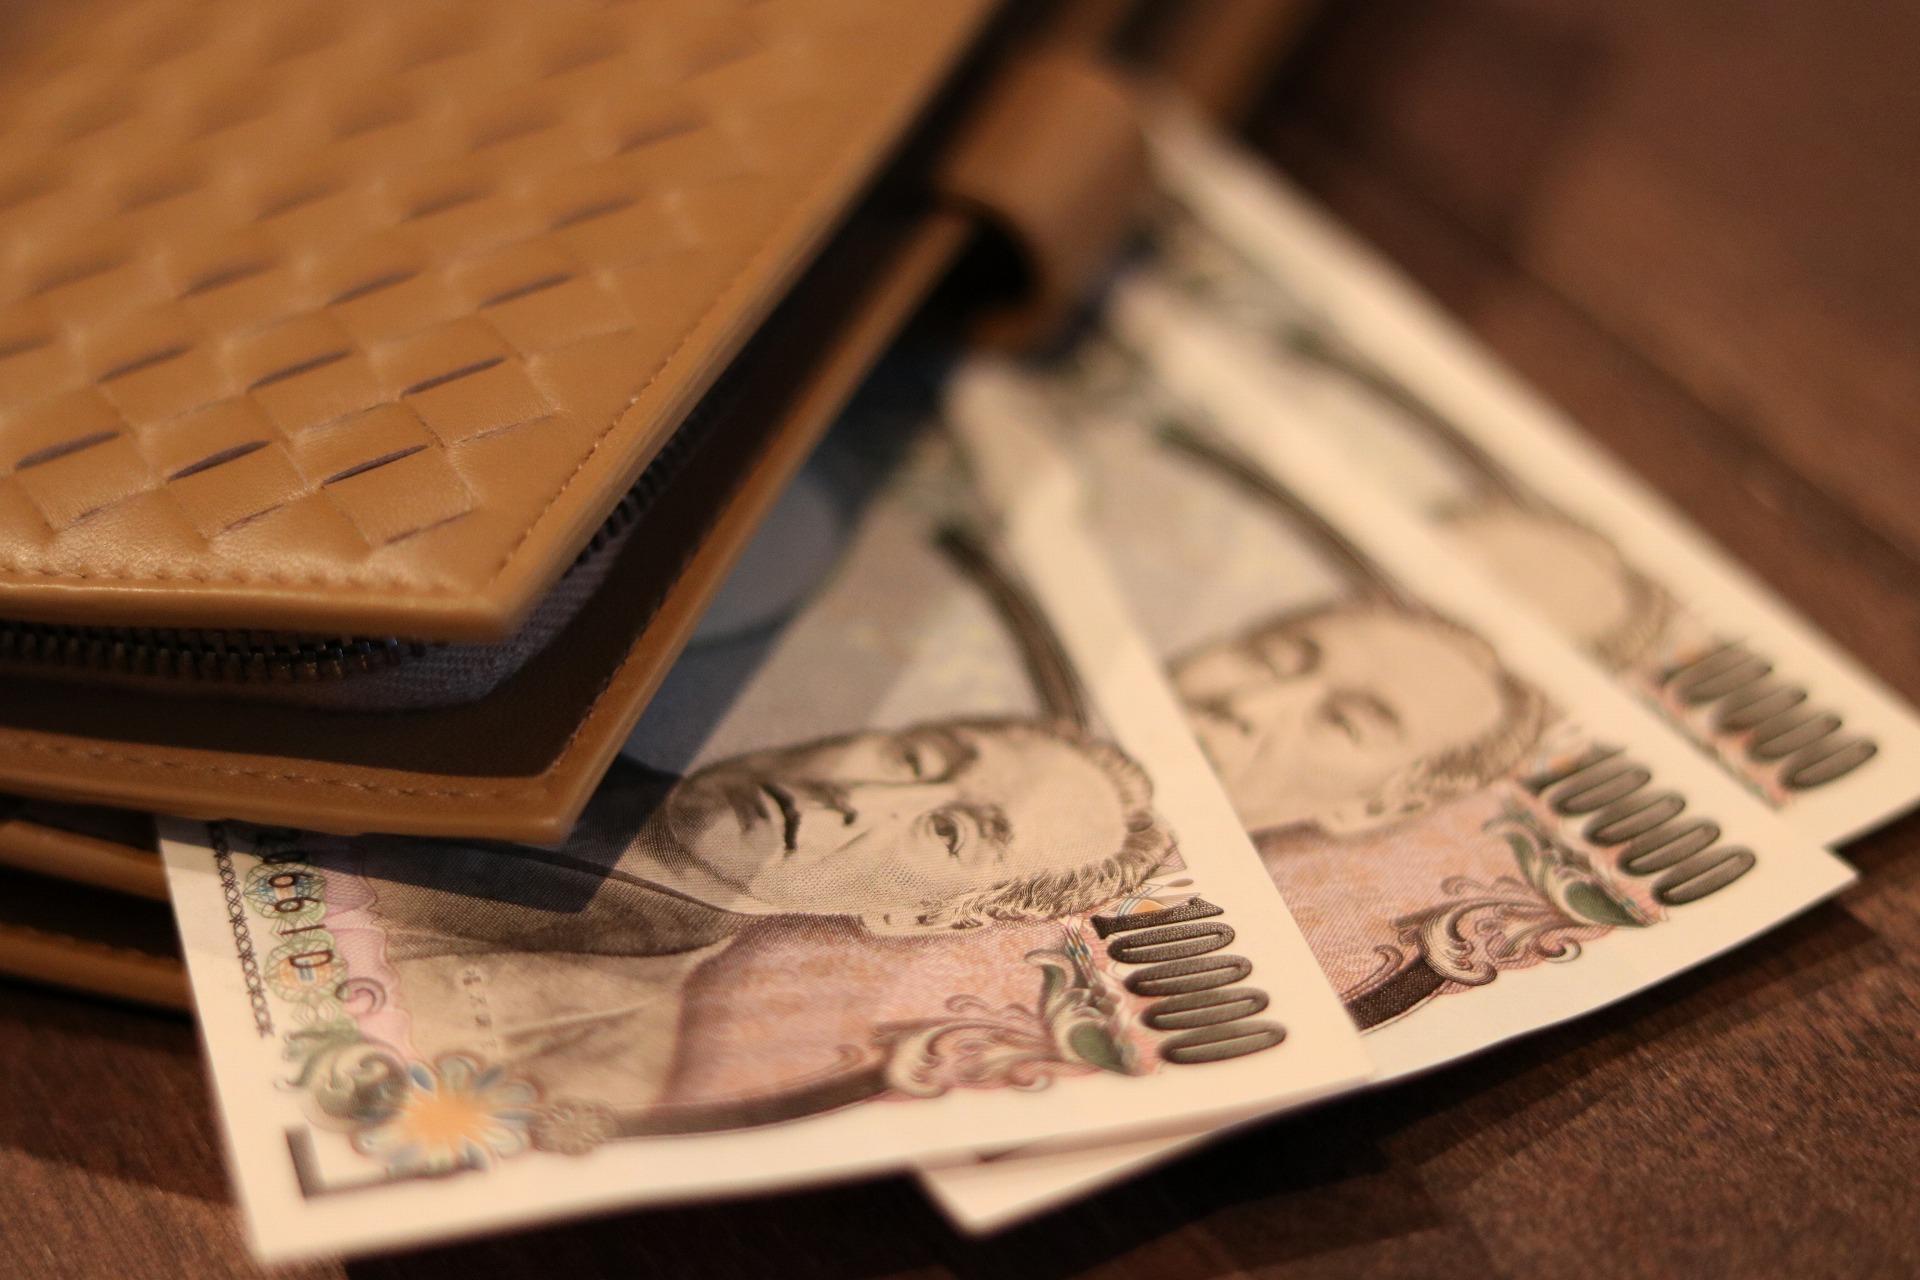 財布と1万円札3枚